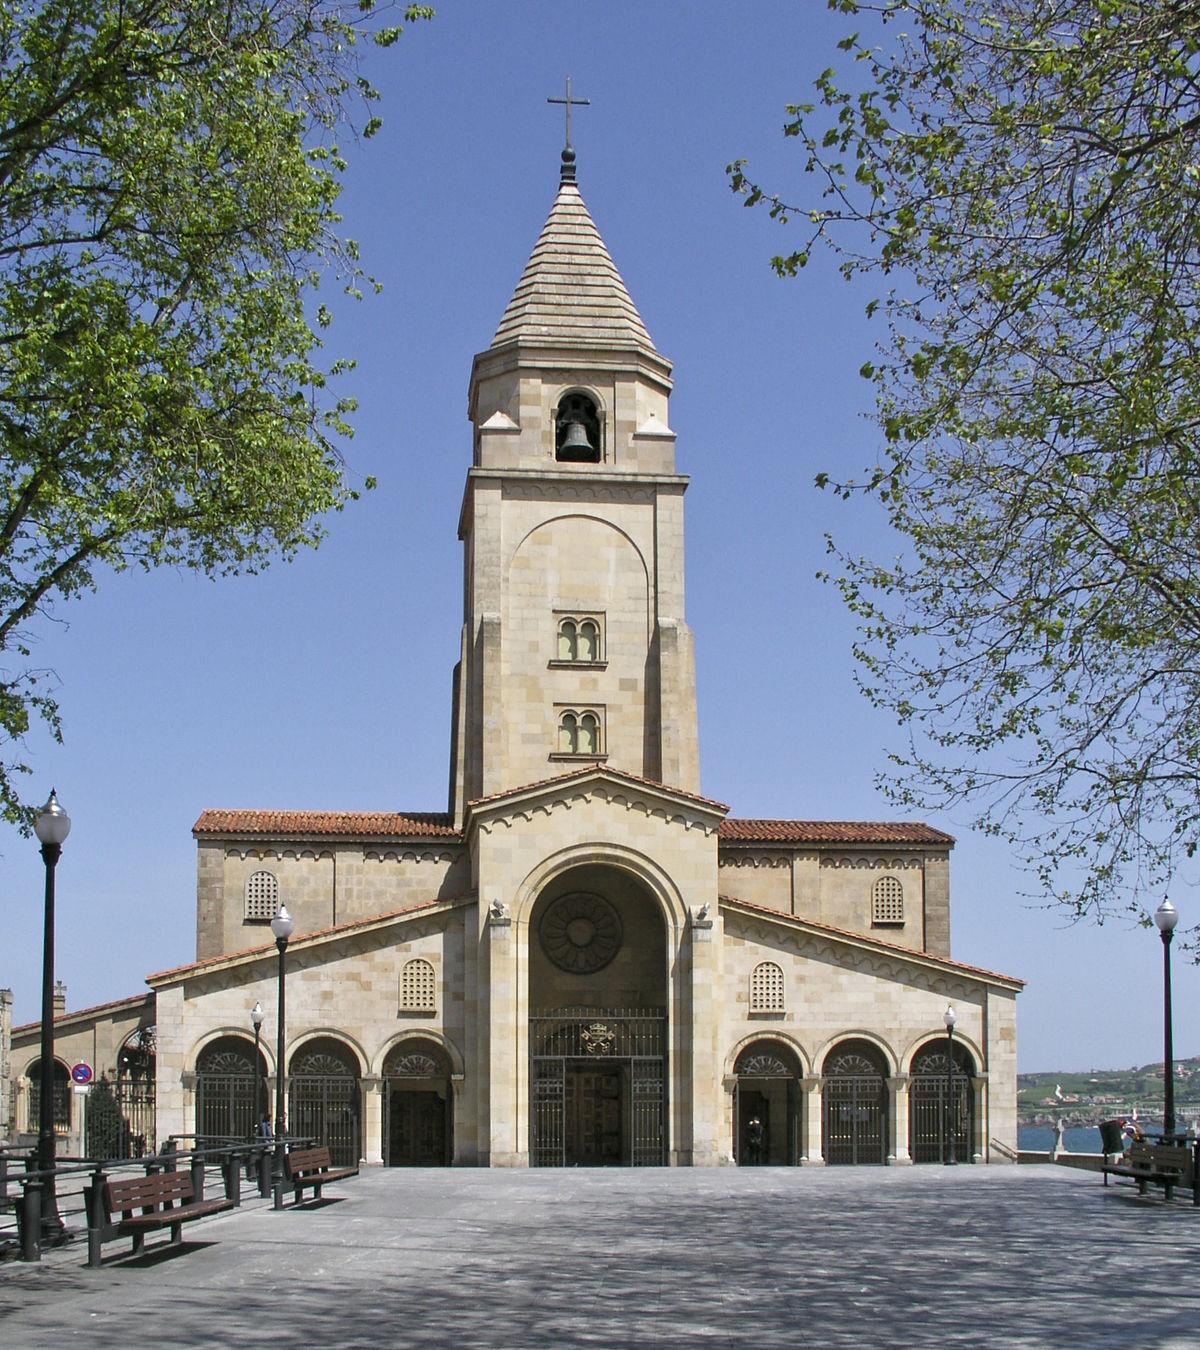 Iglesia de San Pedro (Gijón) - Wikipedia, la enciclopedia libre